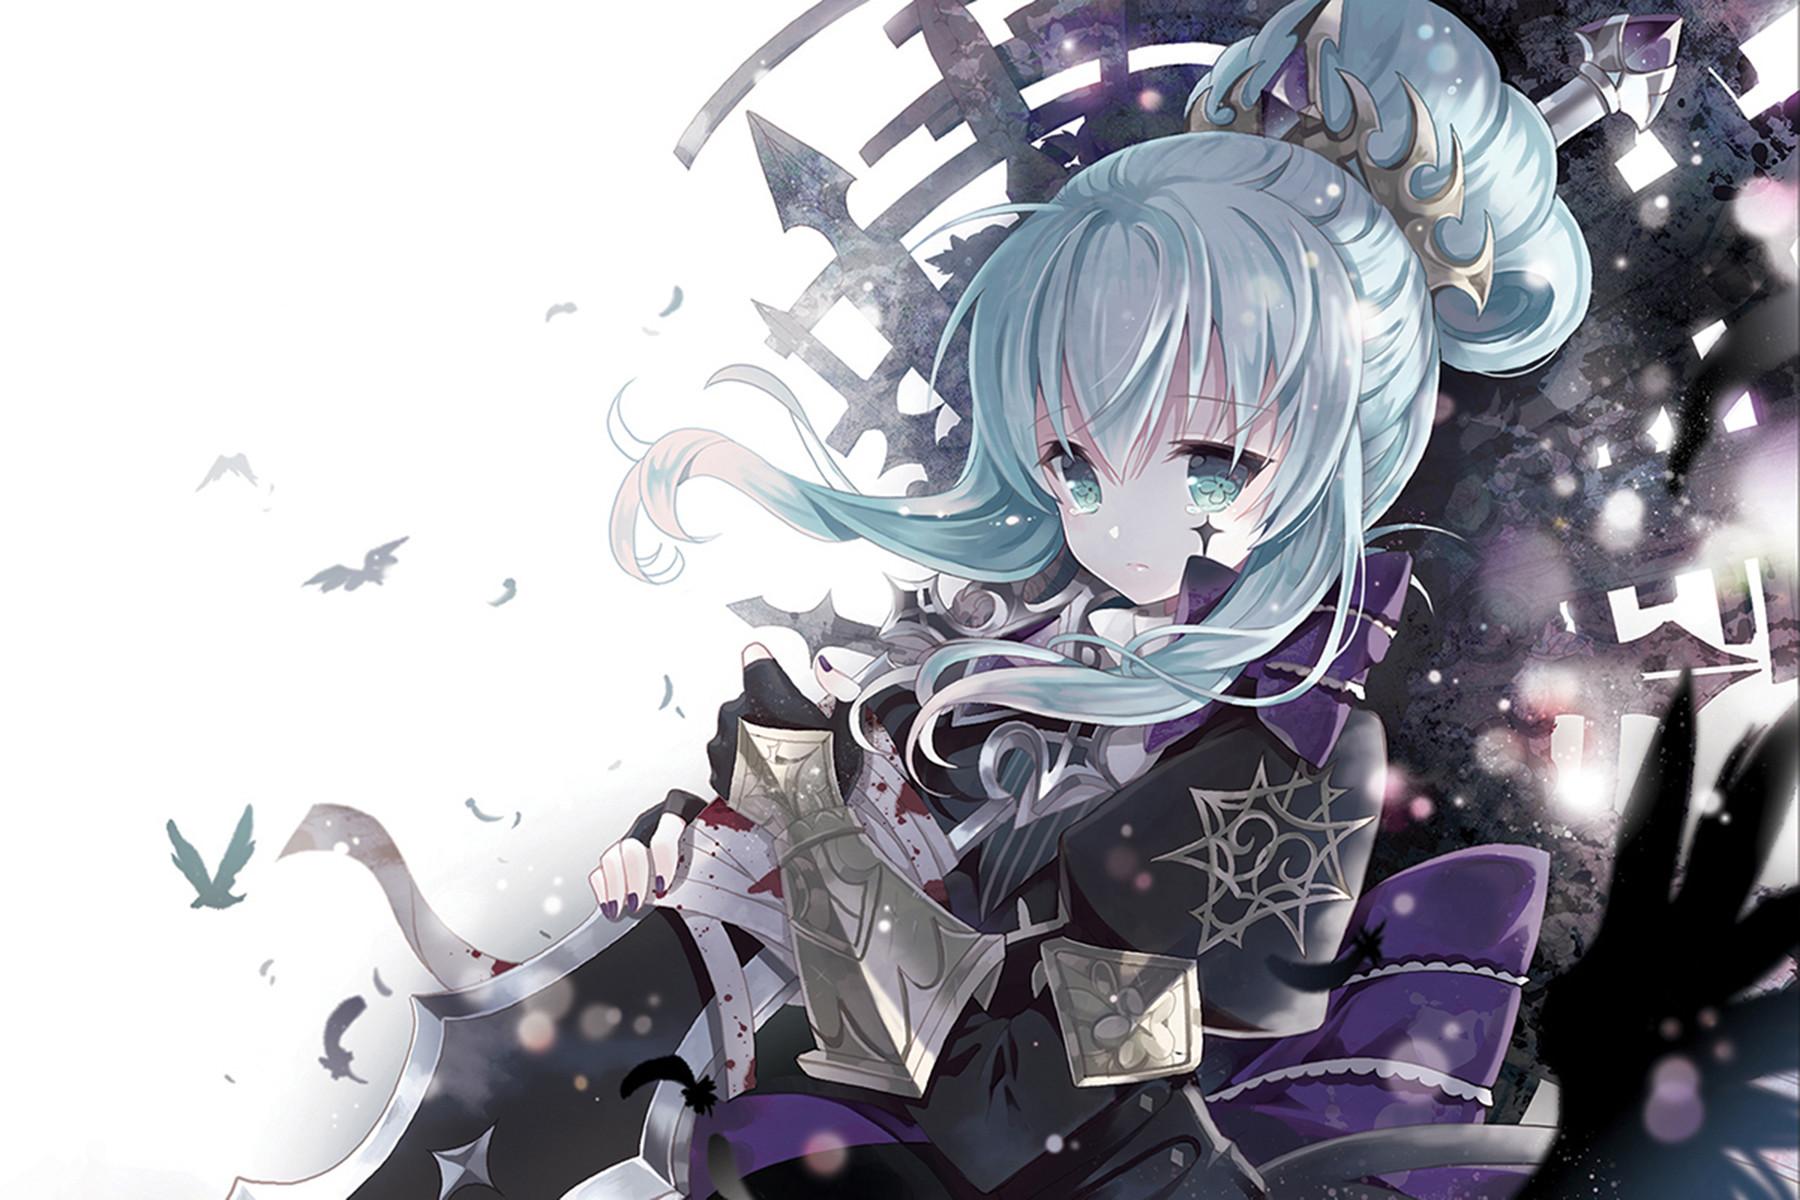 Download 1920x1200 Wallpaper Blue Eyes Blue Hair Cute Sad Anime